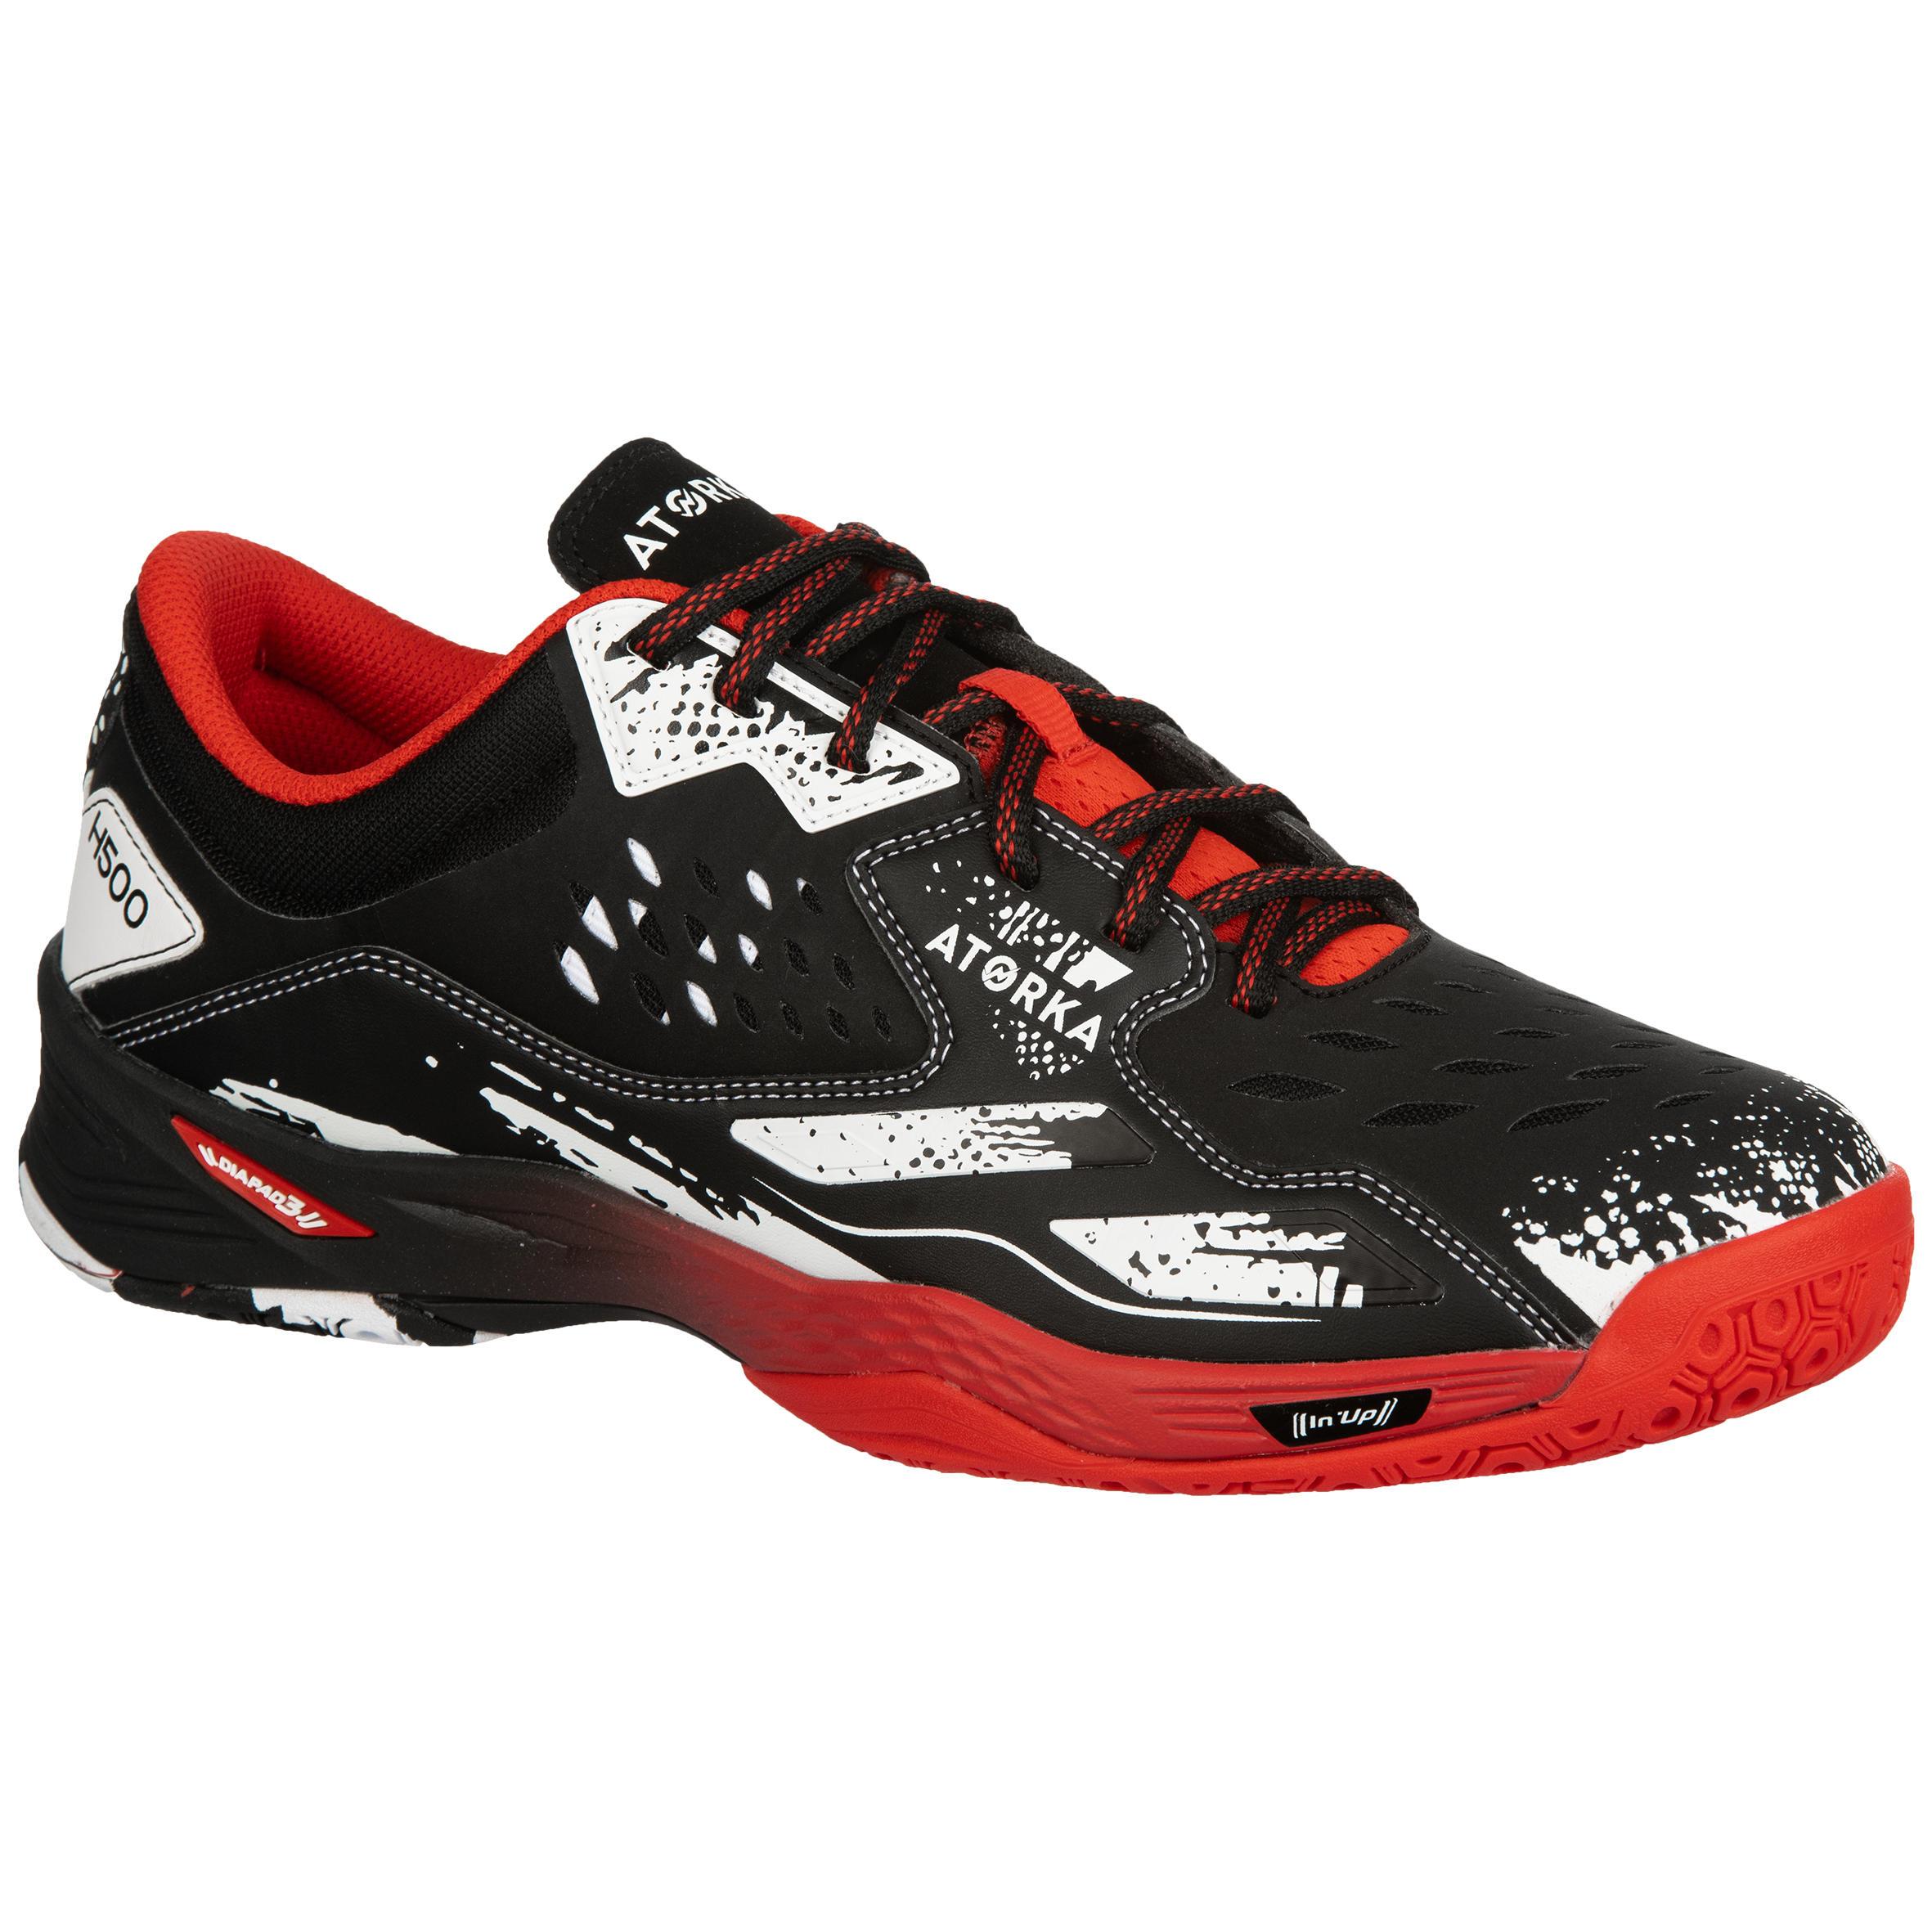 Handballschuhe H500 Erwachsene | Schuhe > Sportschuhe > Handballschuhe | Atorka